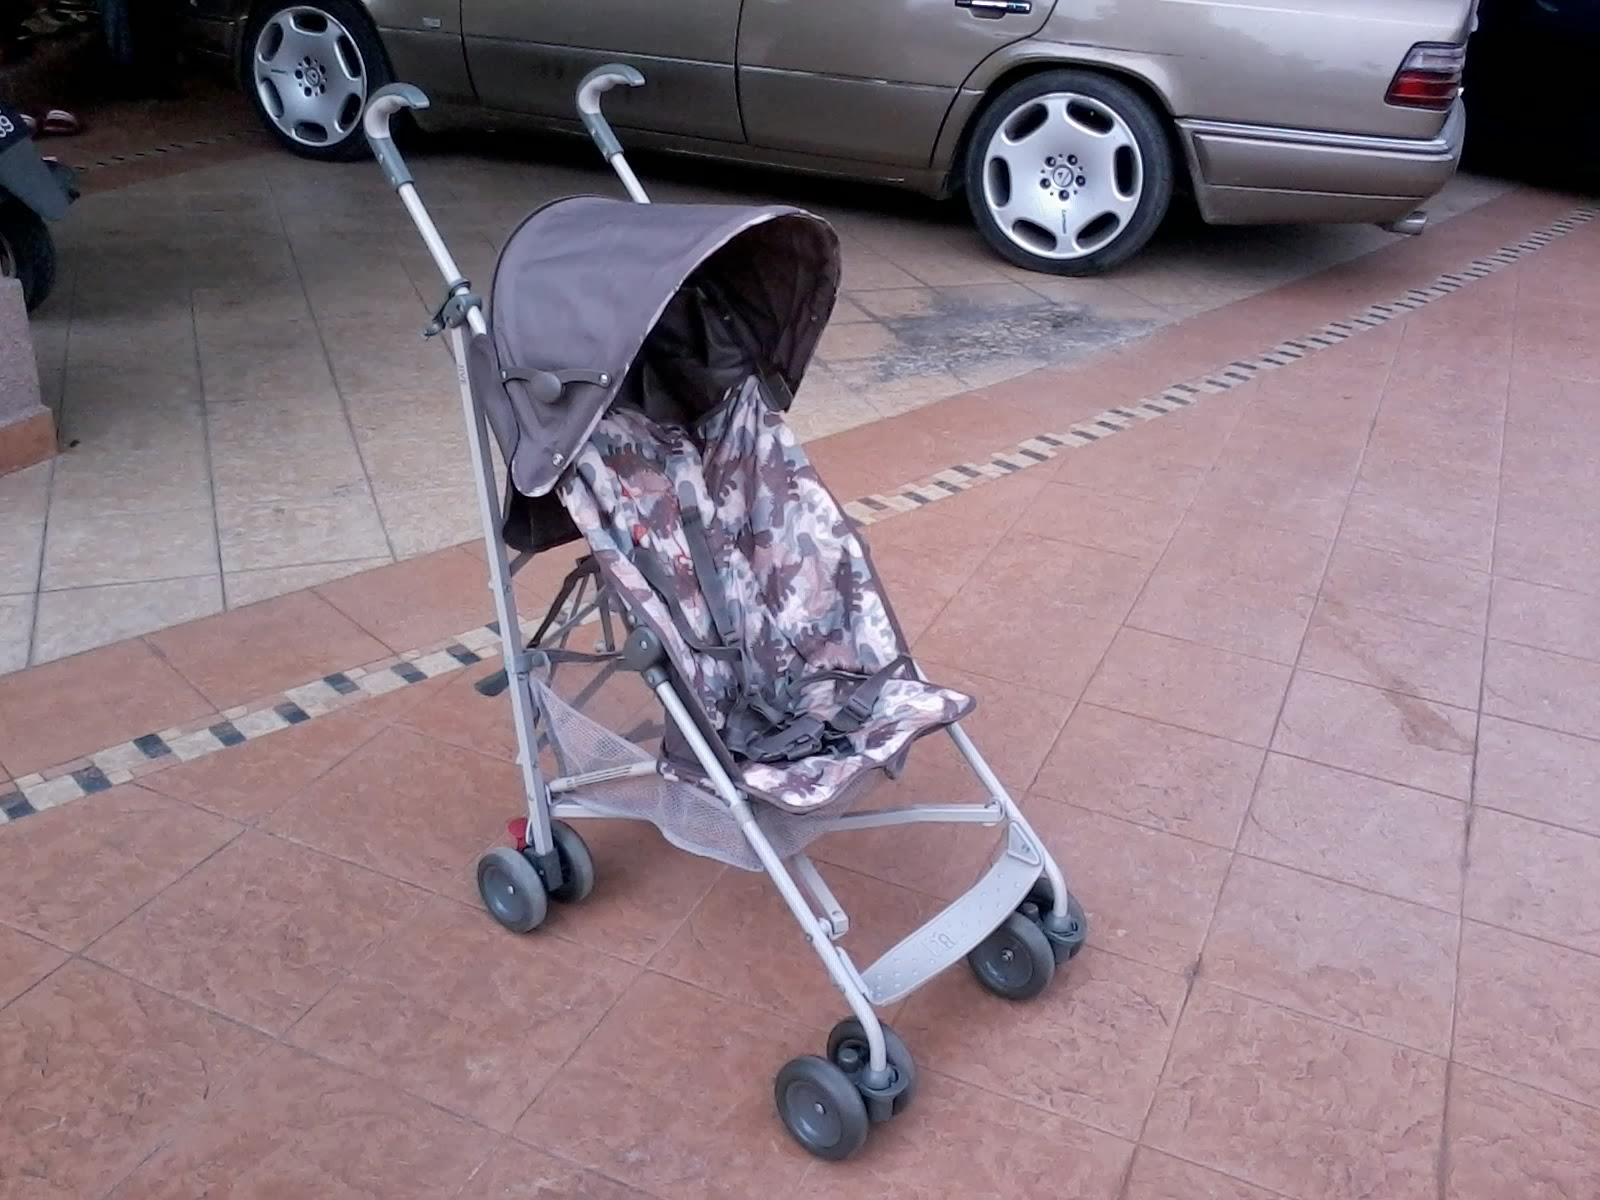 aliff preloved store mothercare jive buggy : 20140119151942 from aliffprelovedstore.blogspot.com size 1600 x 1200 jpeg 226kB